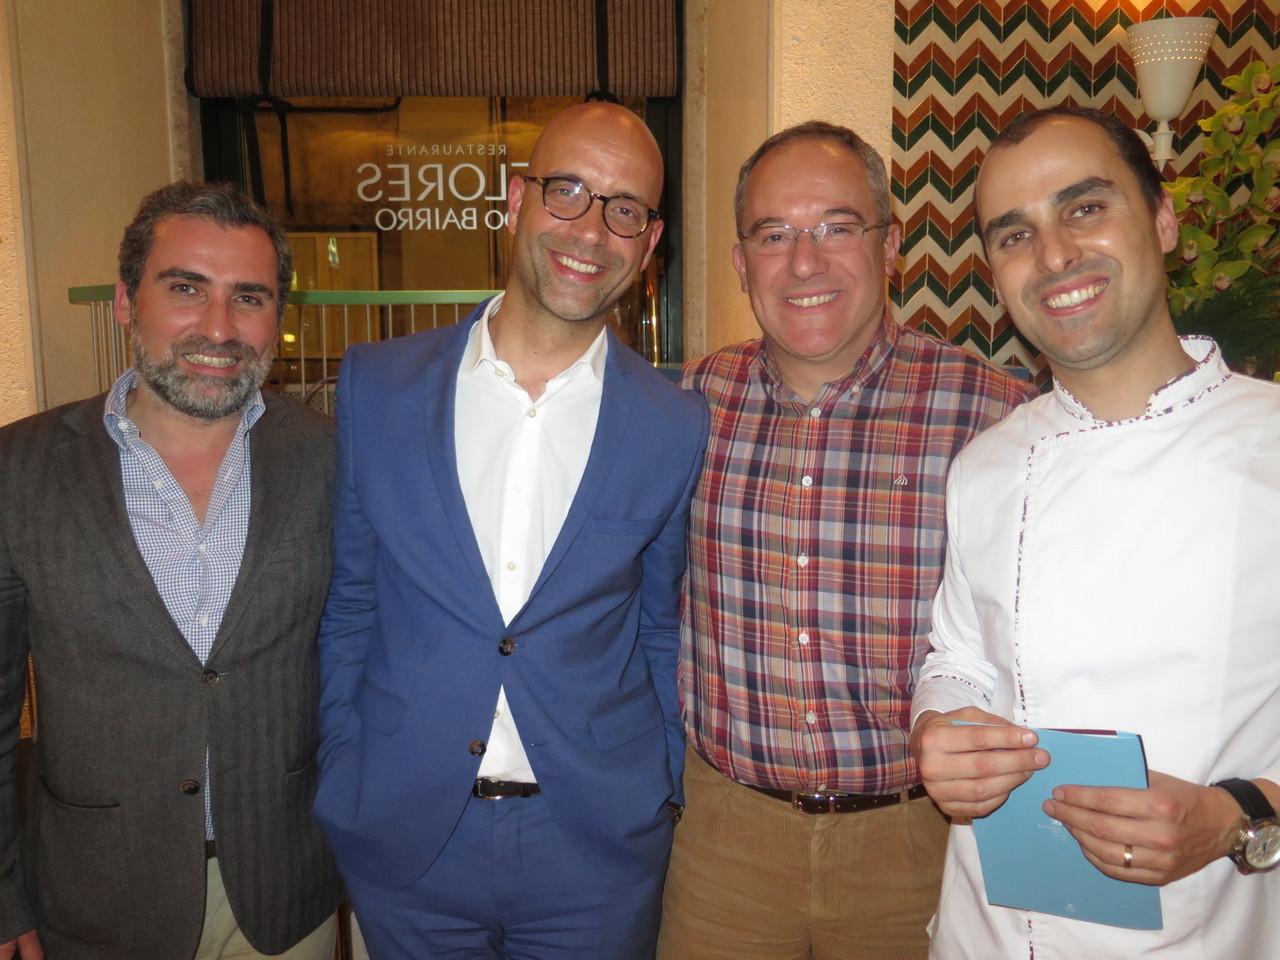 Nuno Nobre, Jorge Cosme, António Alexandre, Bruno Rocha